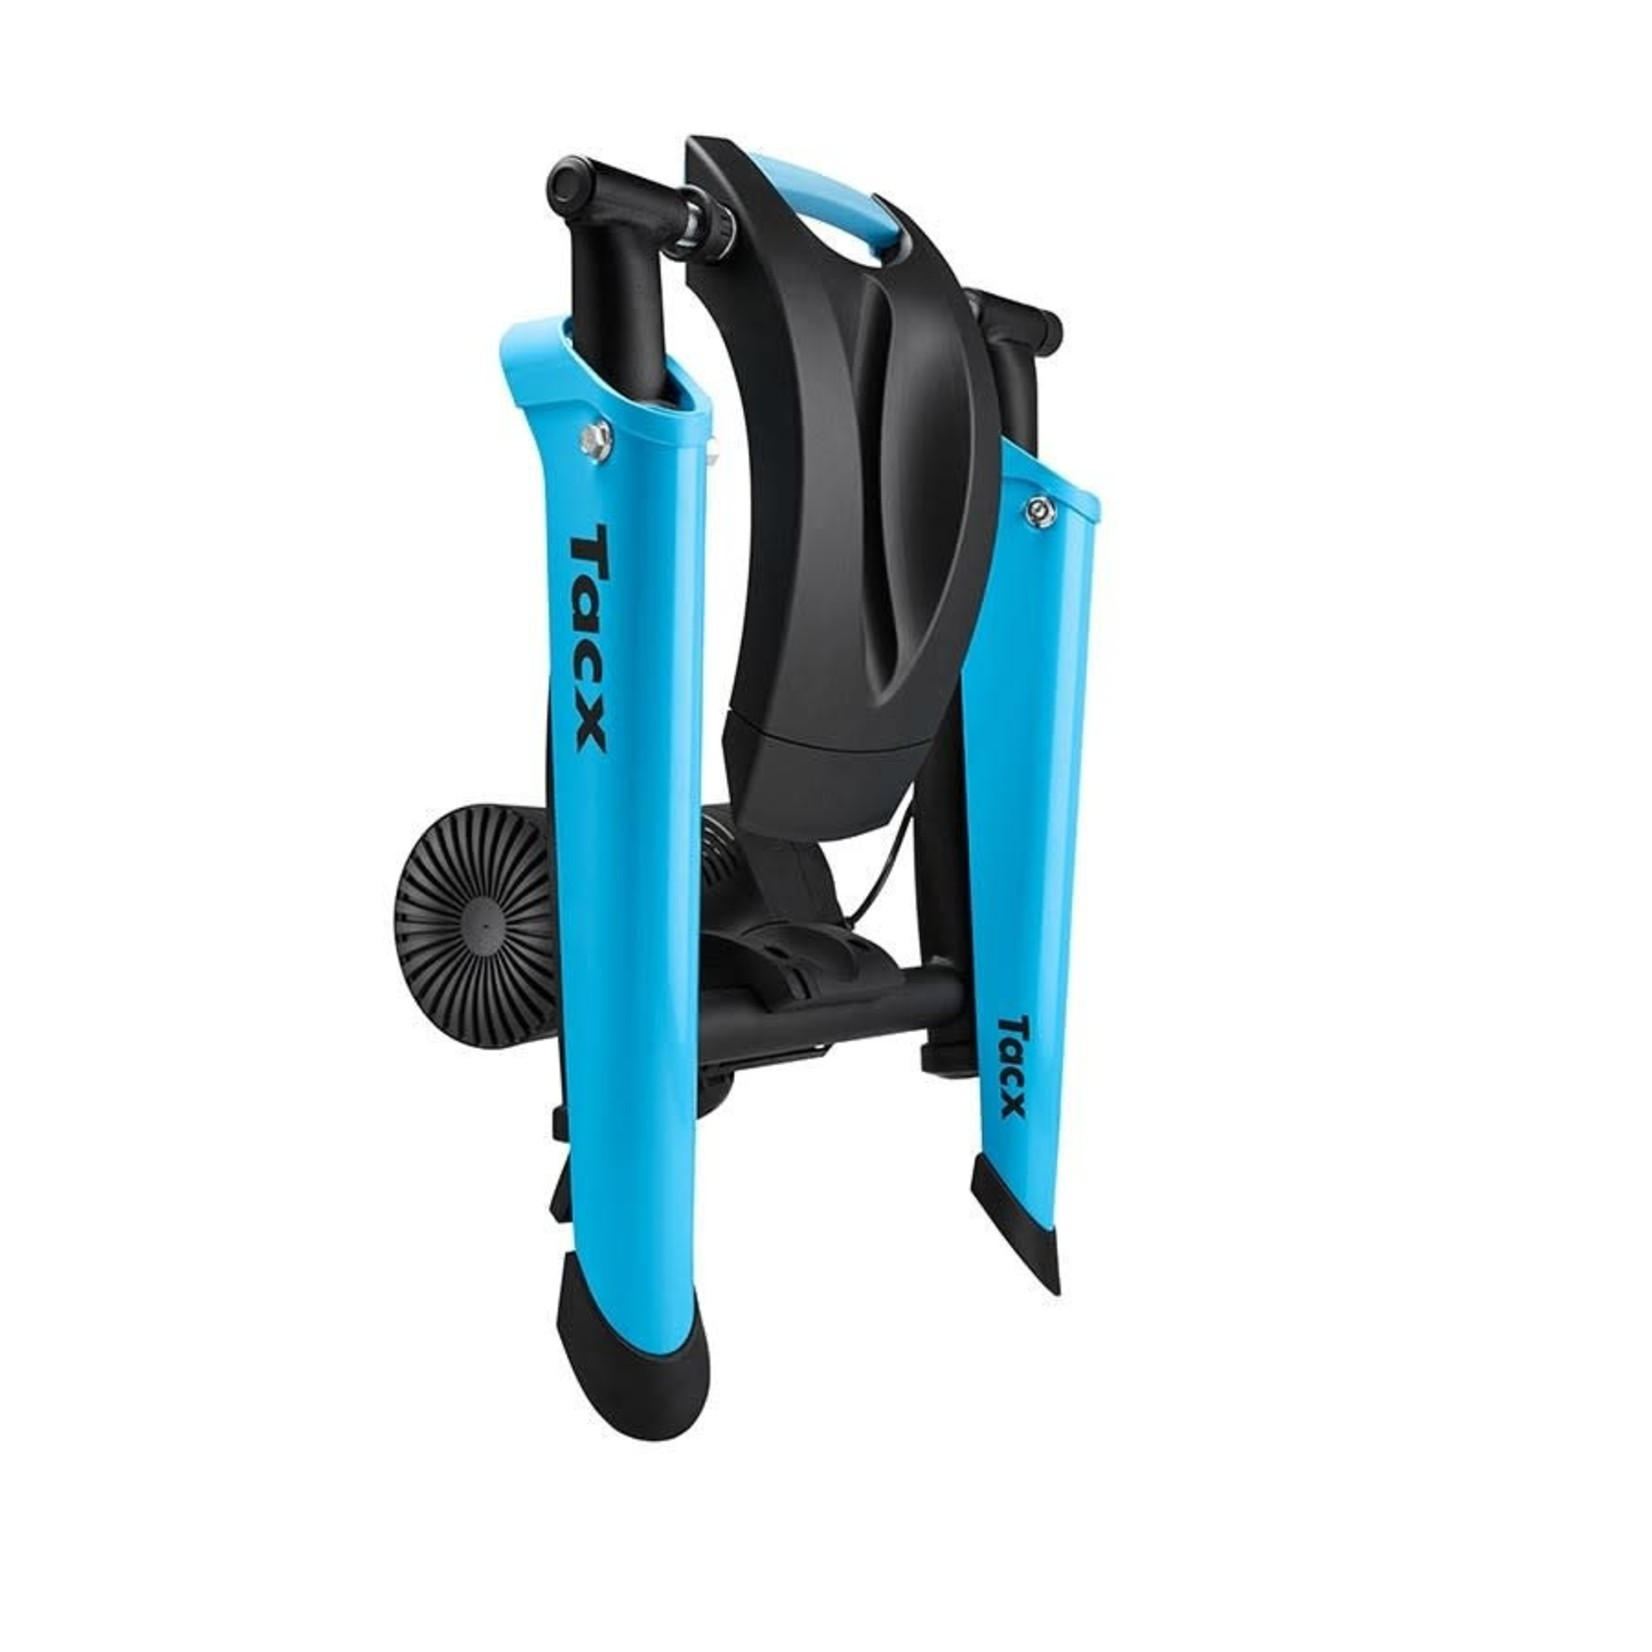 Tacx Bike Trainer, Boost Magnetic